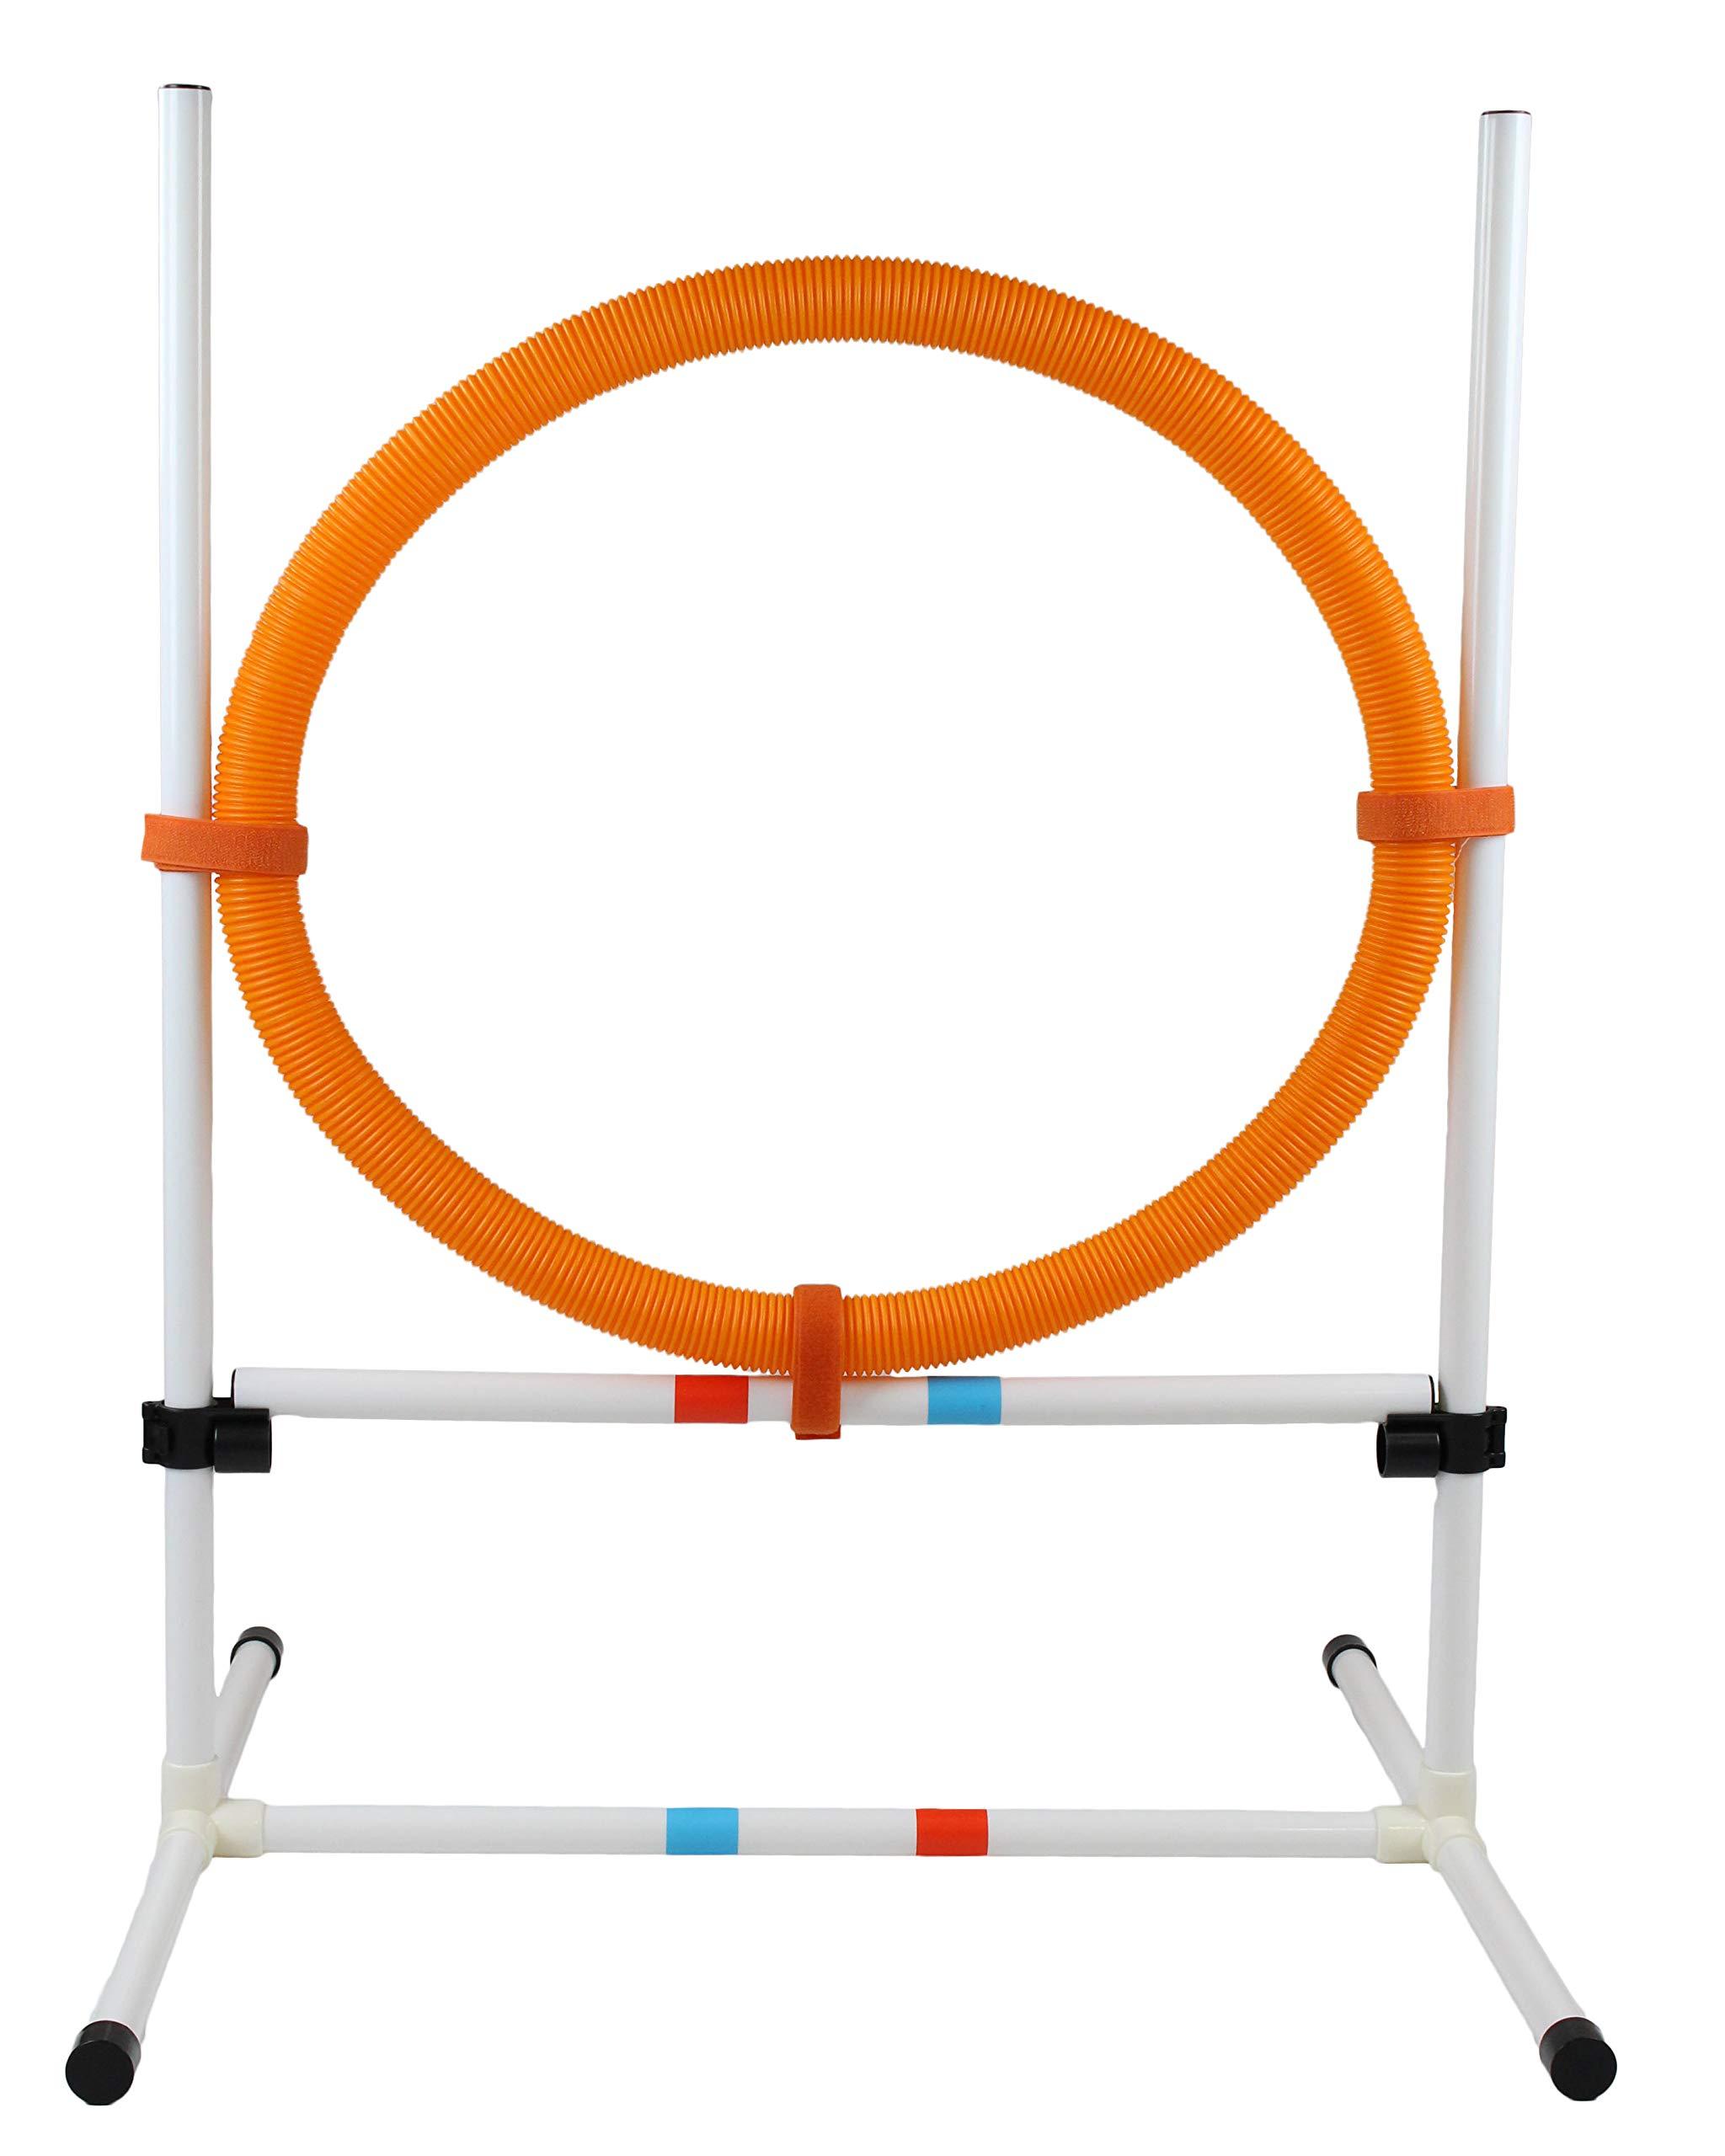 Midlee Dog Agility Hoop Jump Training Equipment by Midlee